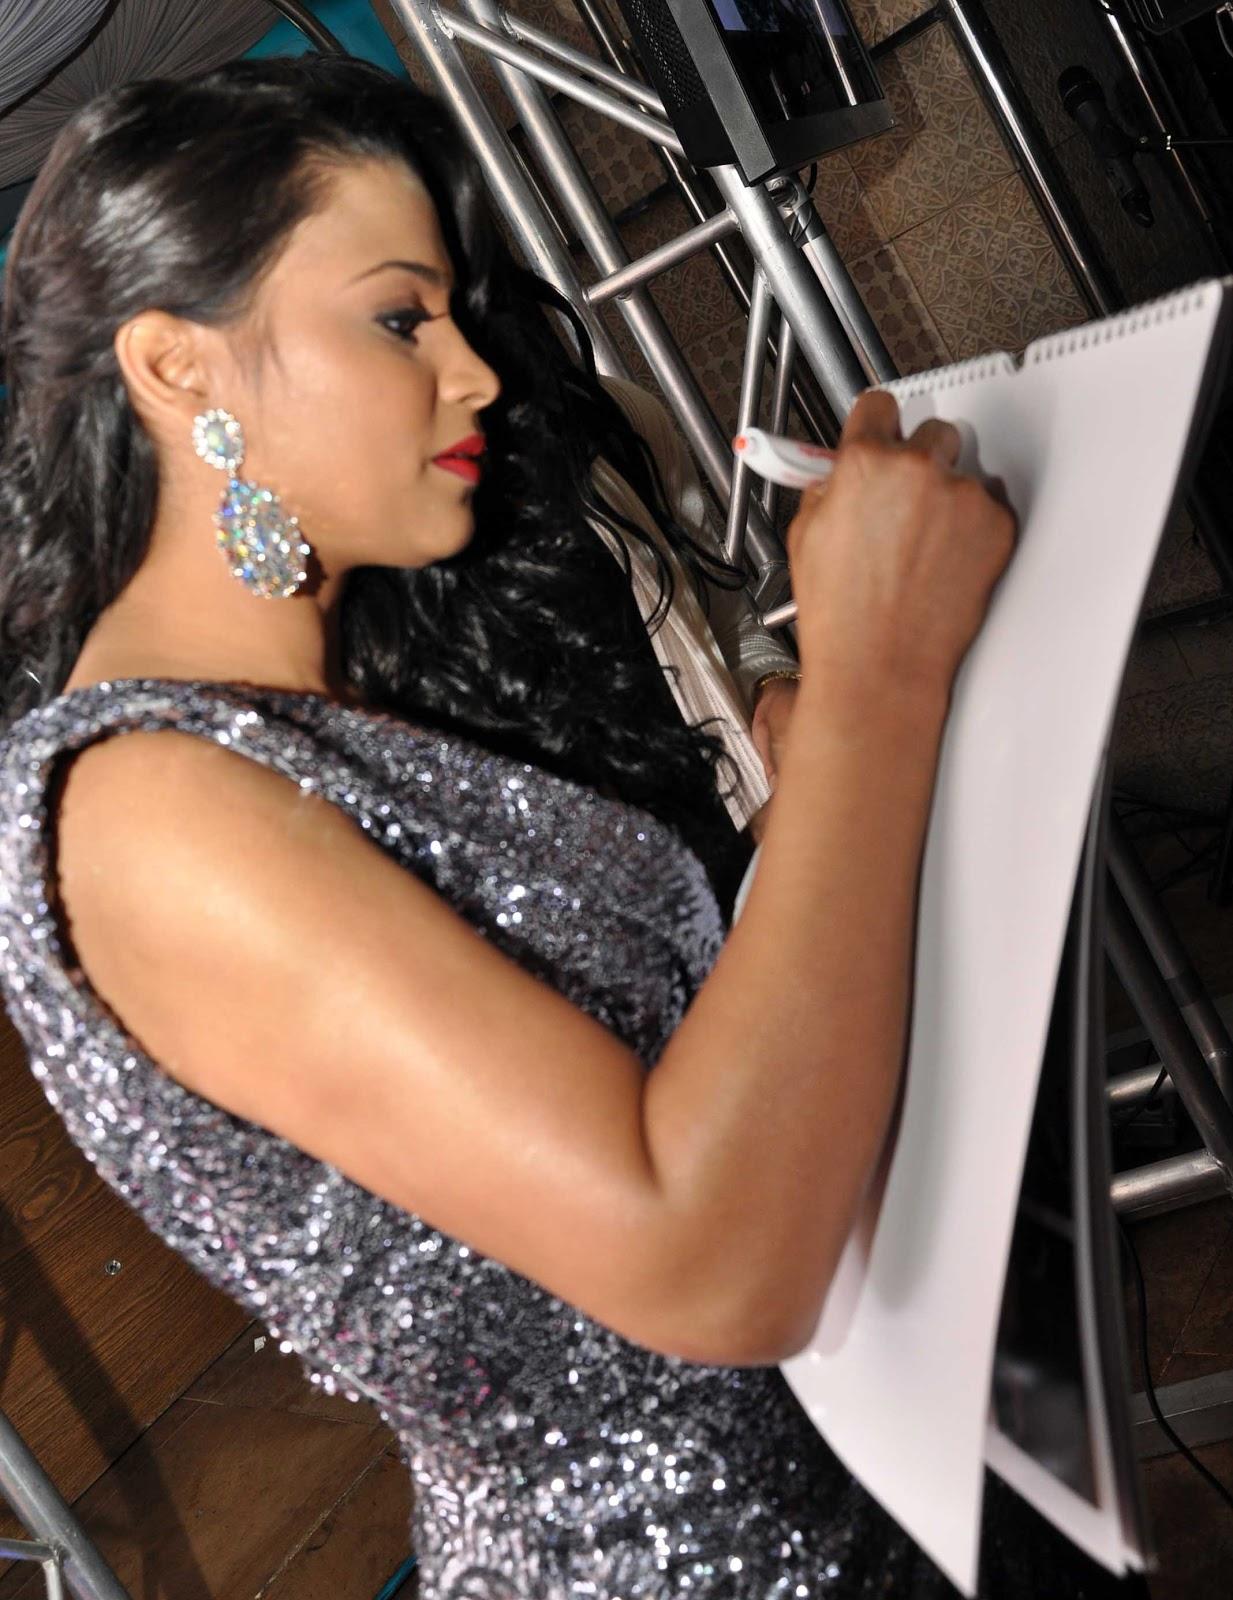 @Famosos_RD News: Presentadora de TV Evelina Garcia ...  |Evelina Garcia